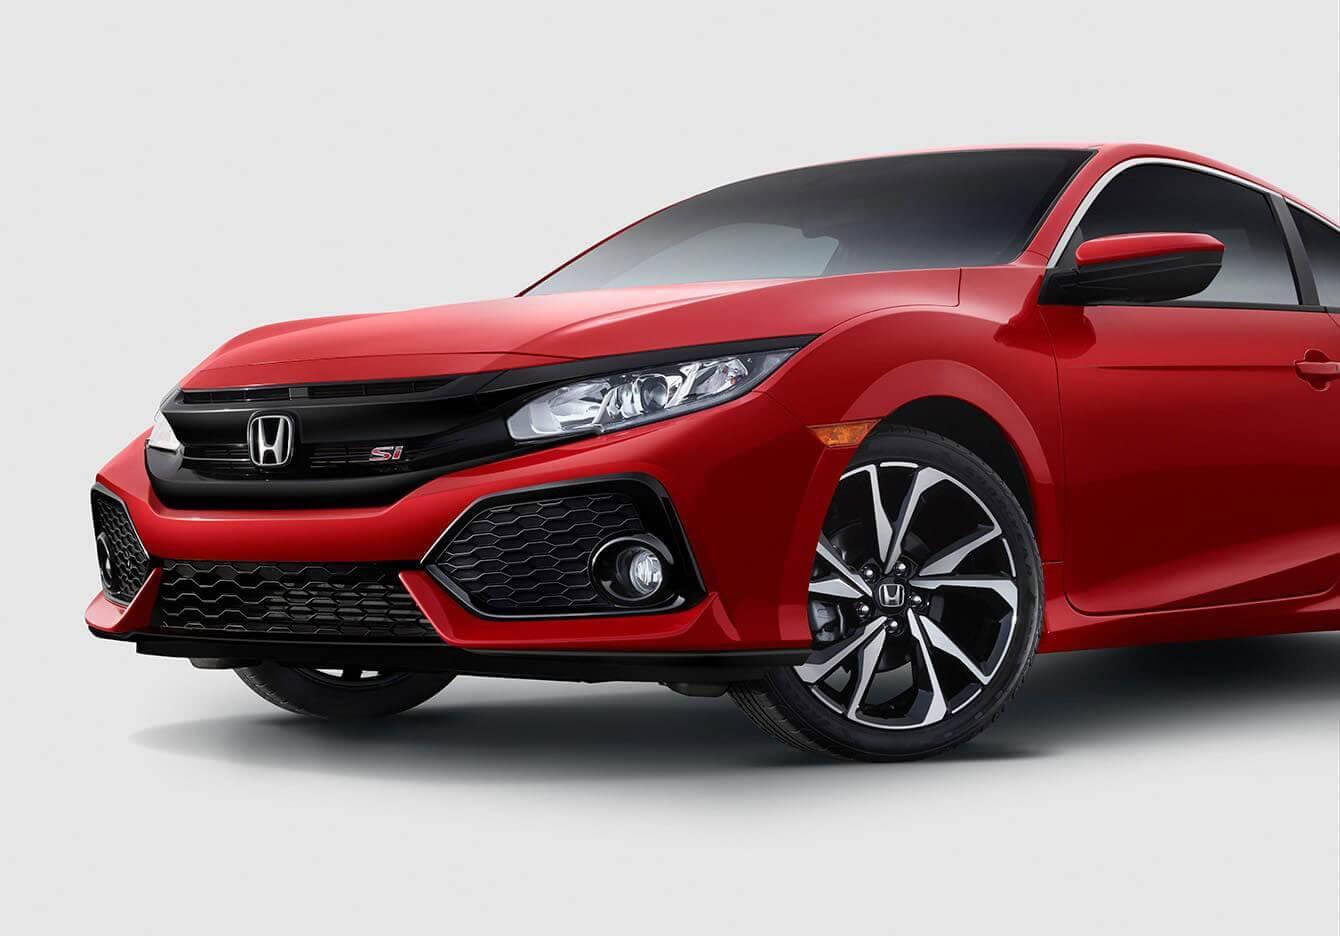 2017 Honda Civic Si Coupe Exterior Wheel Closeup